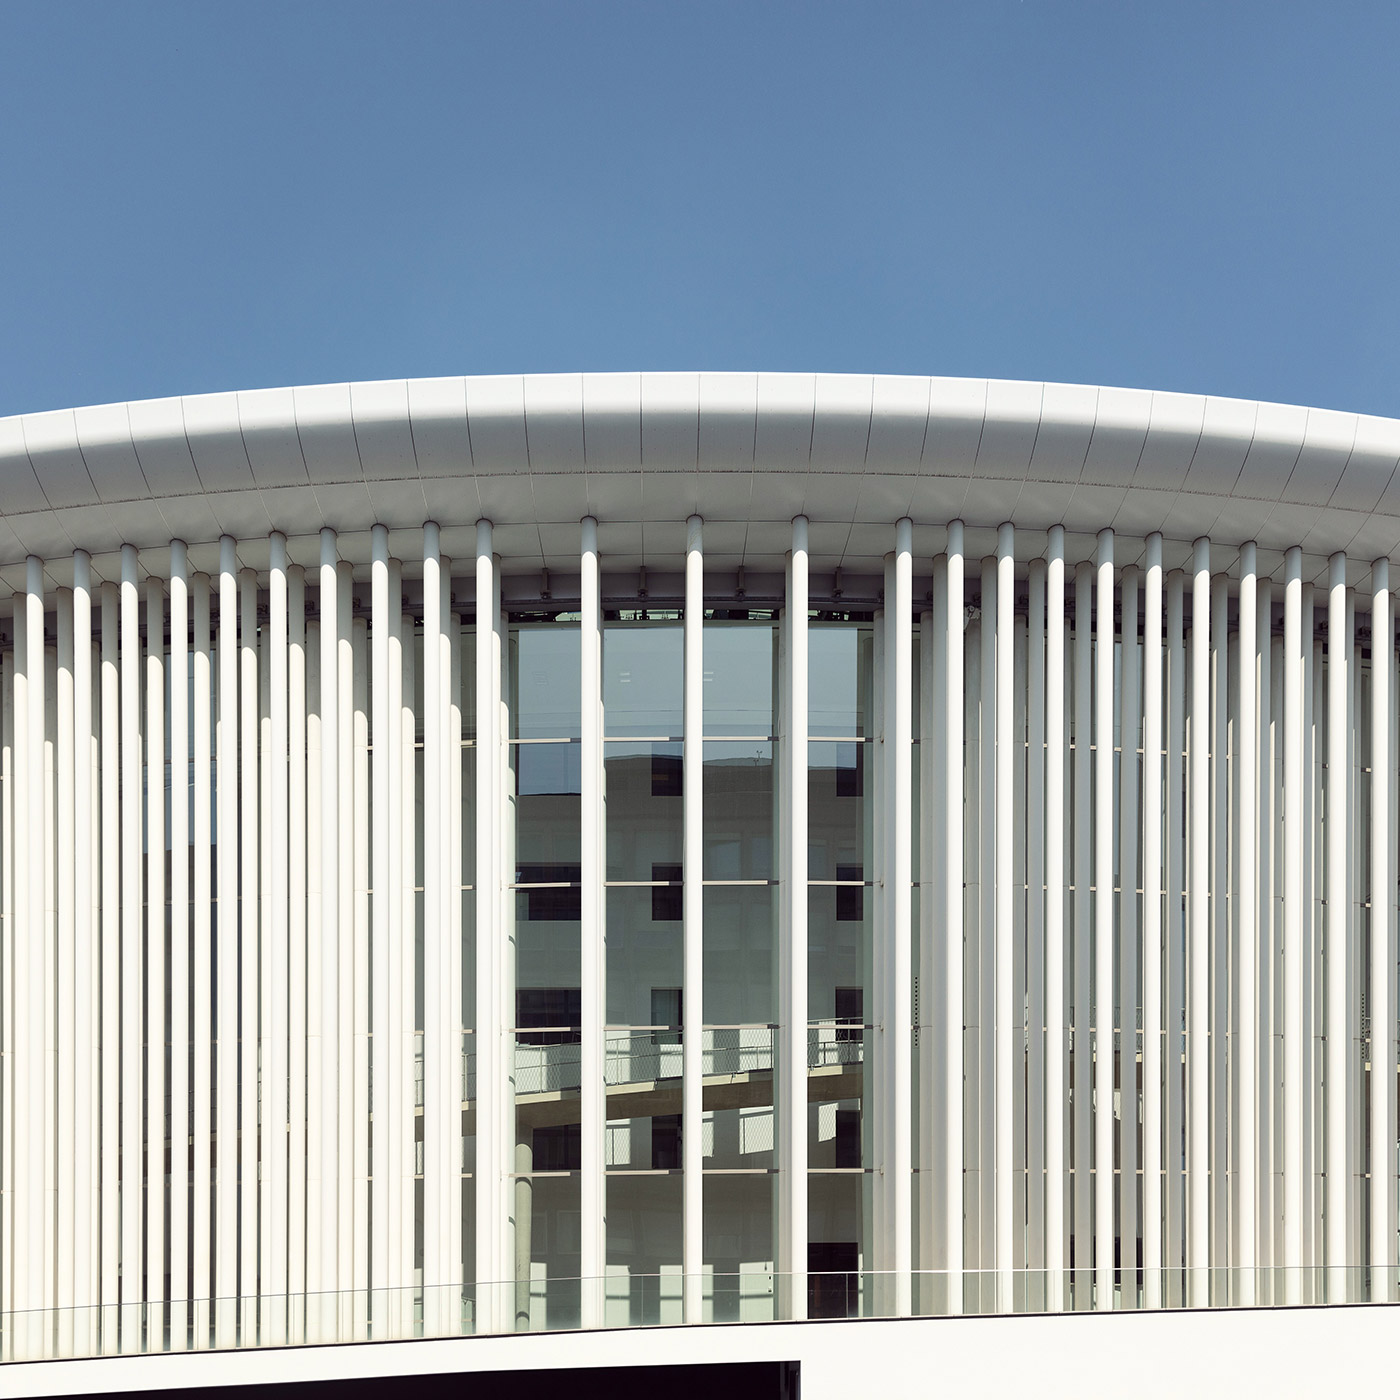 Grande-Duchesse Joséphine-Charlotte Concert Hall . Location: Luxembourg City, Luxembourg . Architect: Christian de Portzamparc